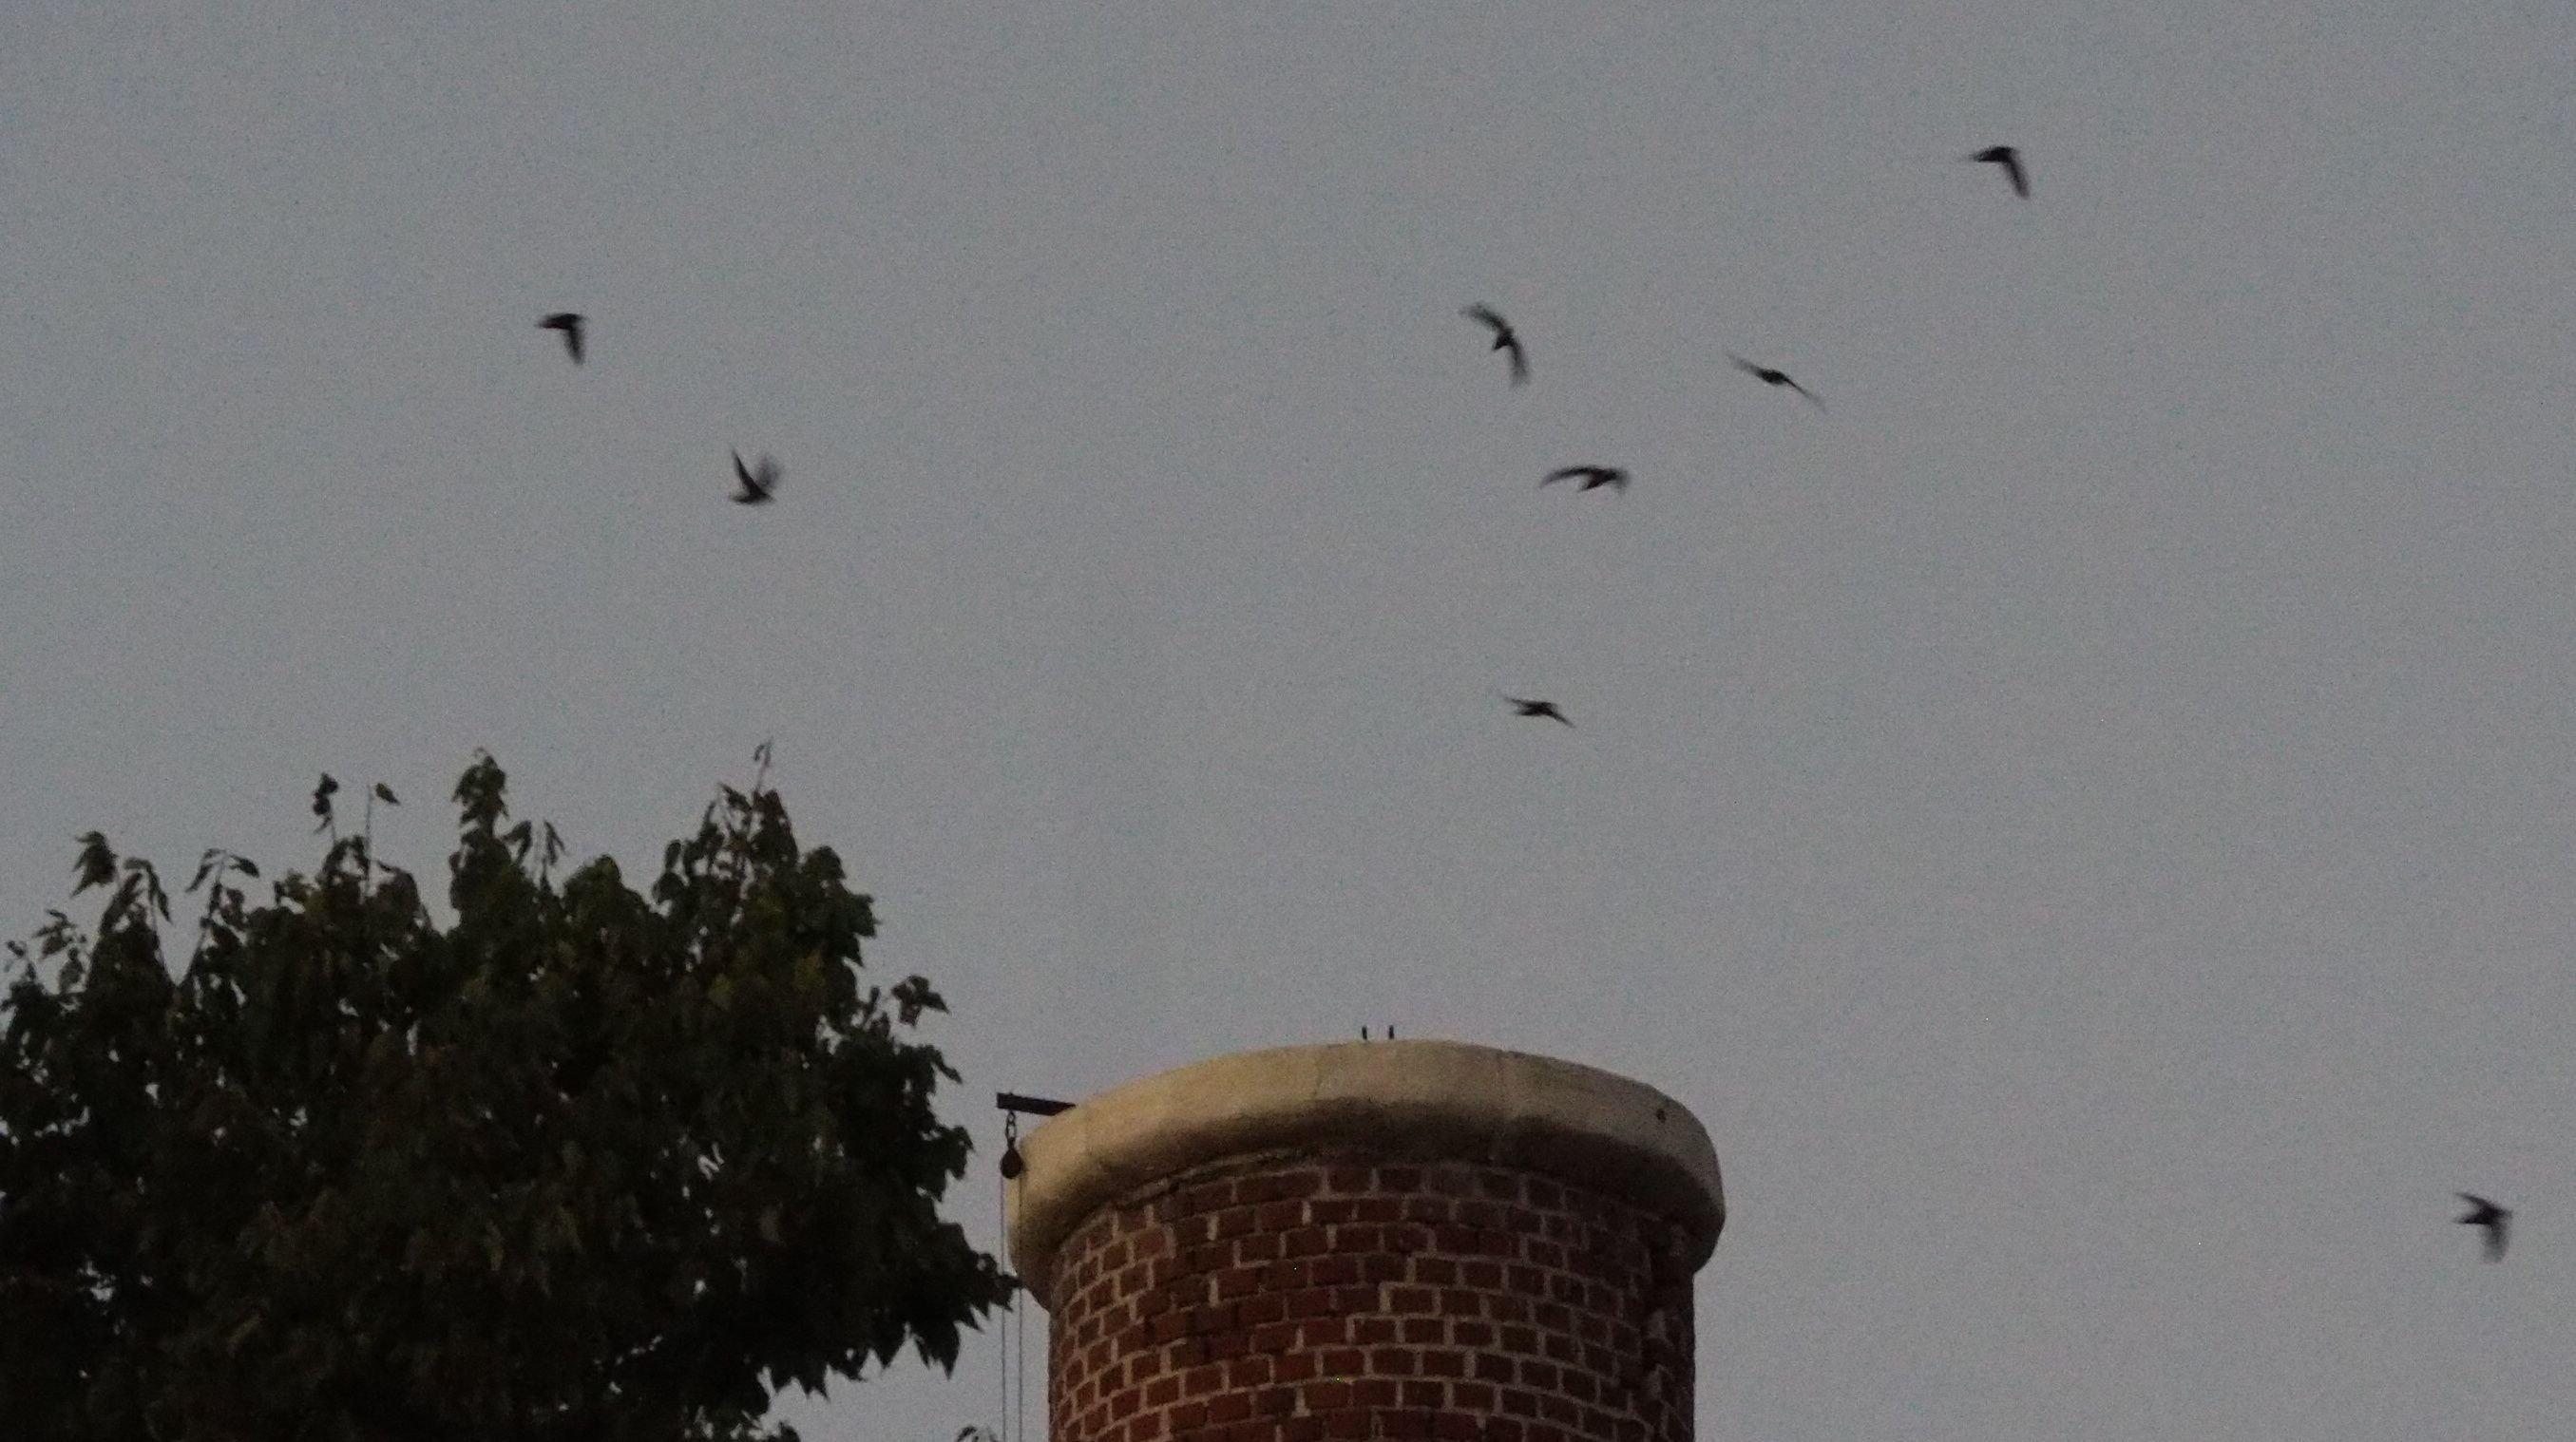 Swifts entering chimney